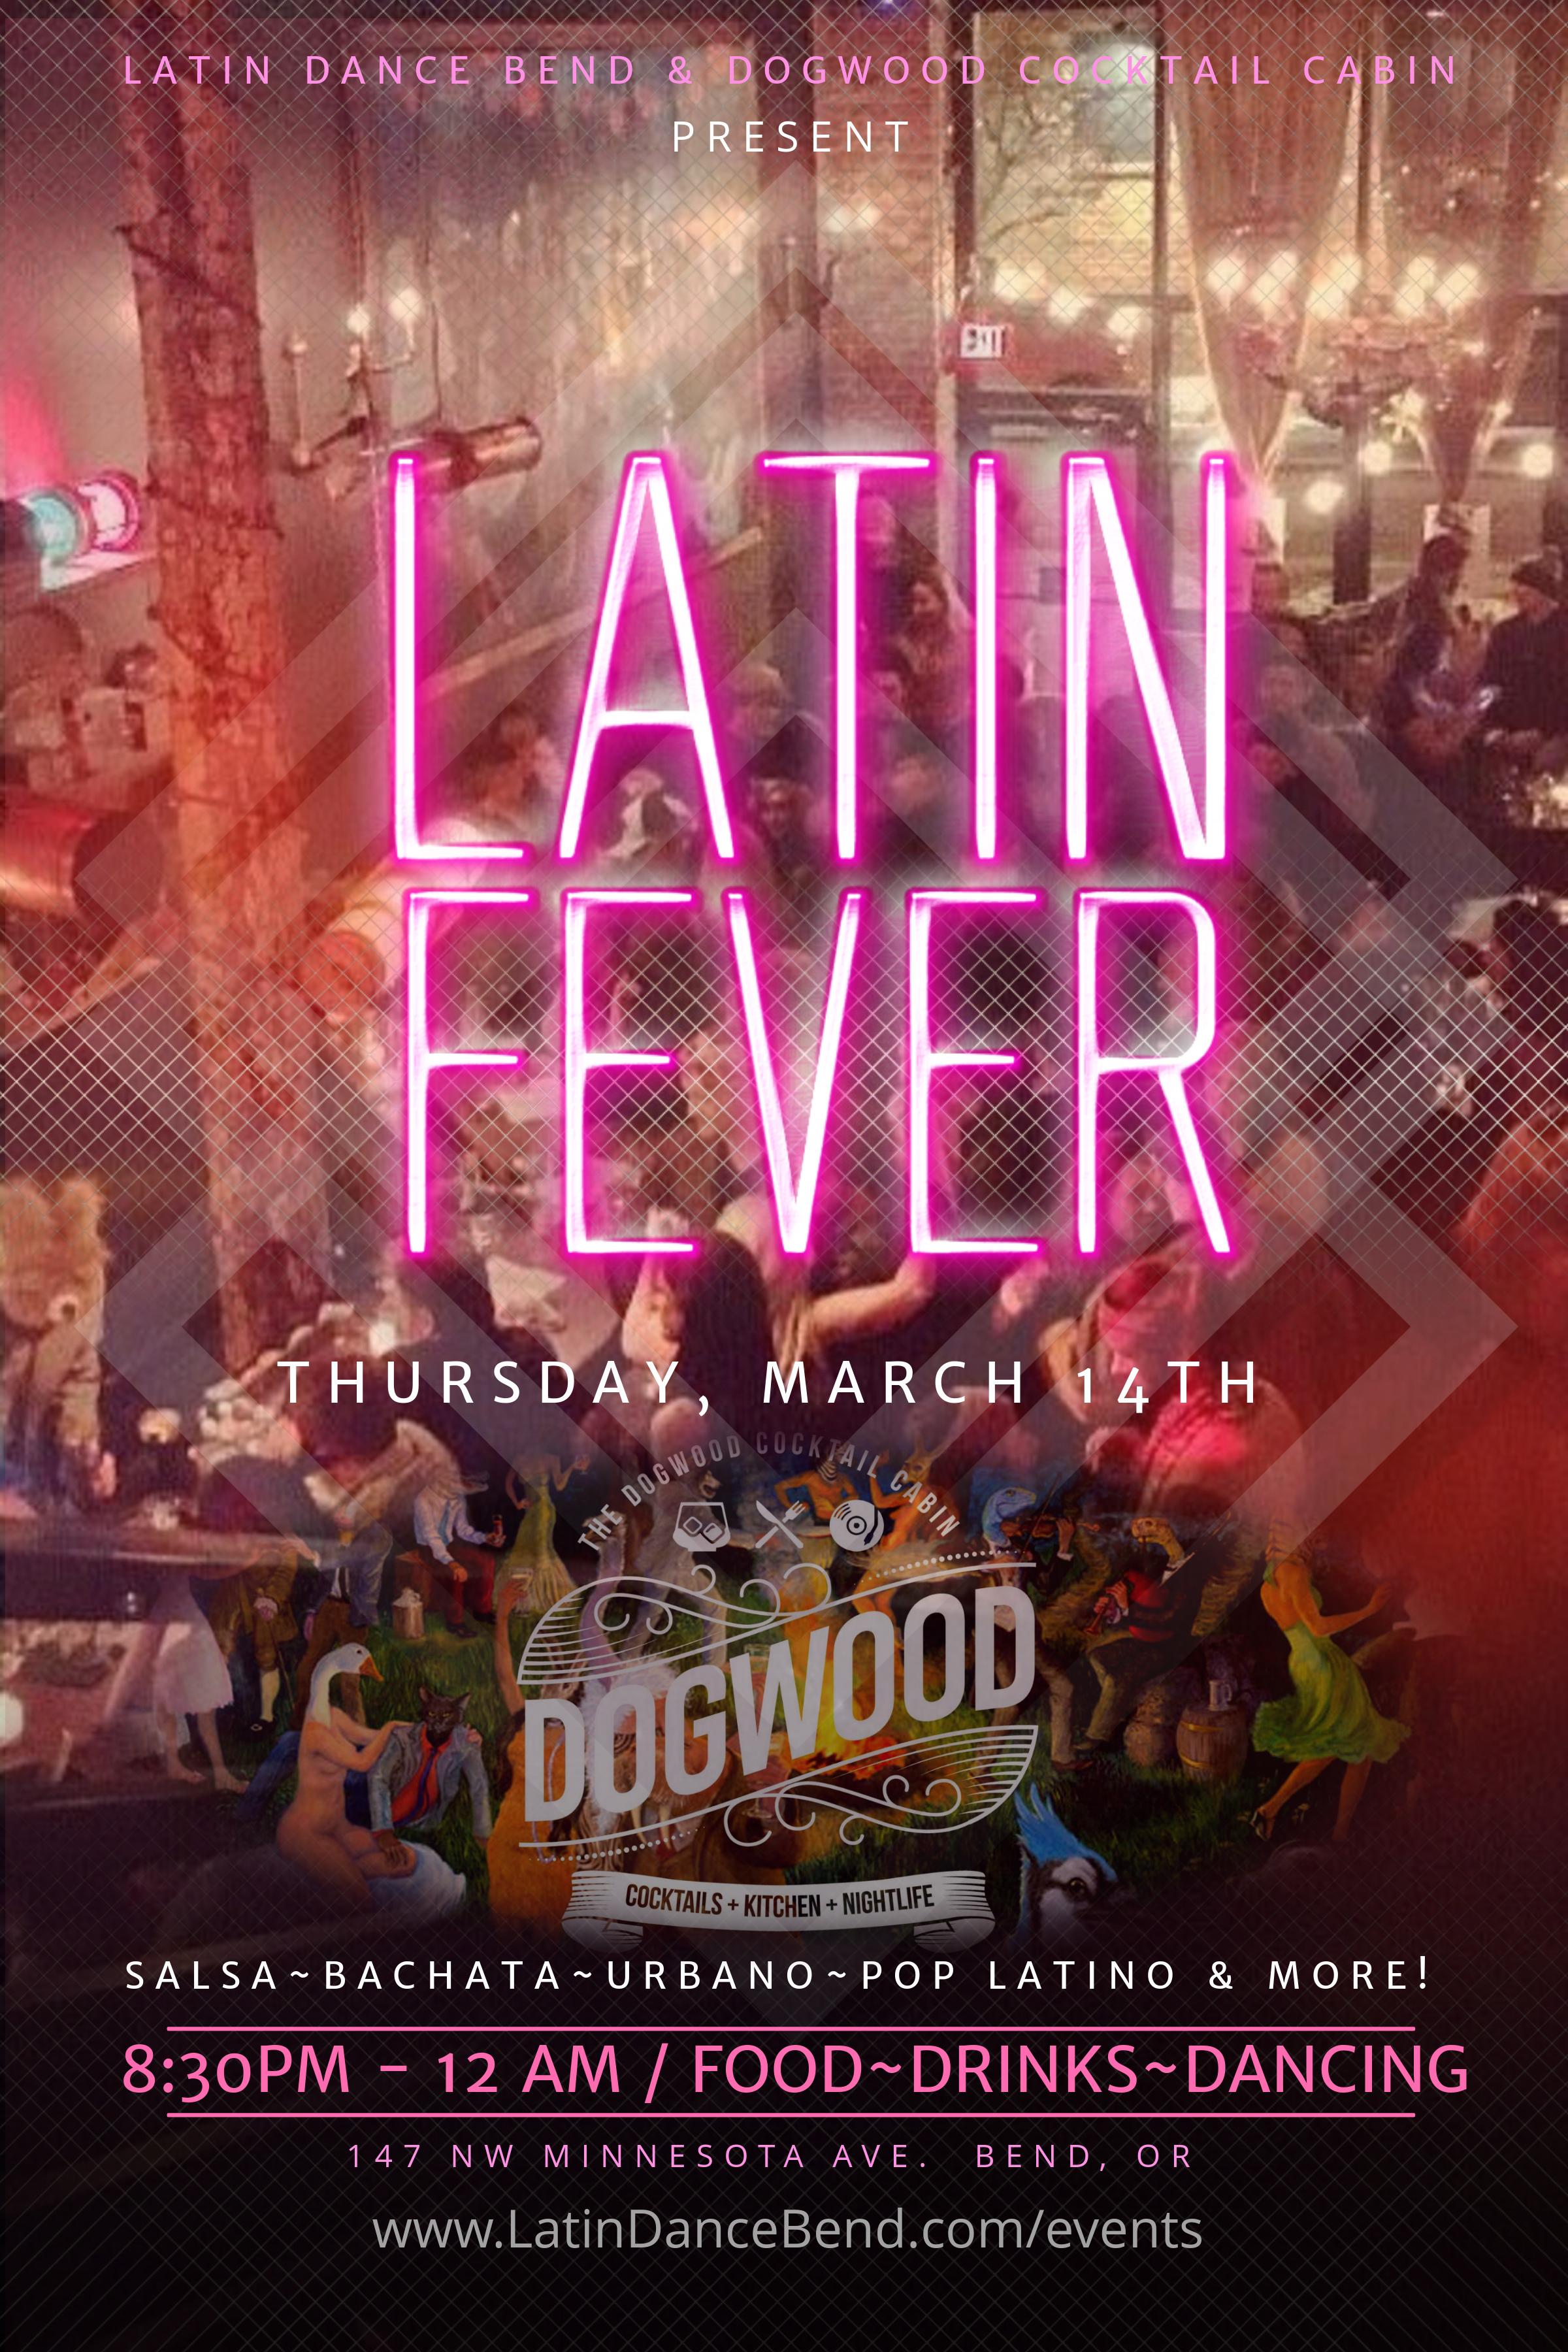 LatinFEVER-Dogwood-March14.jpg